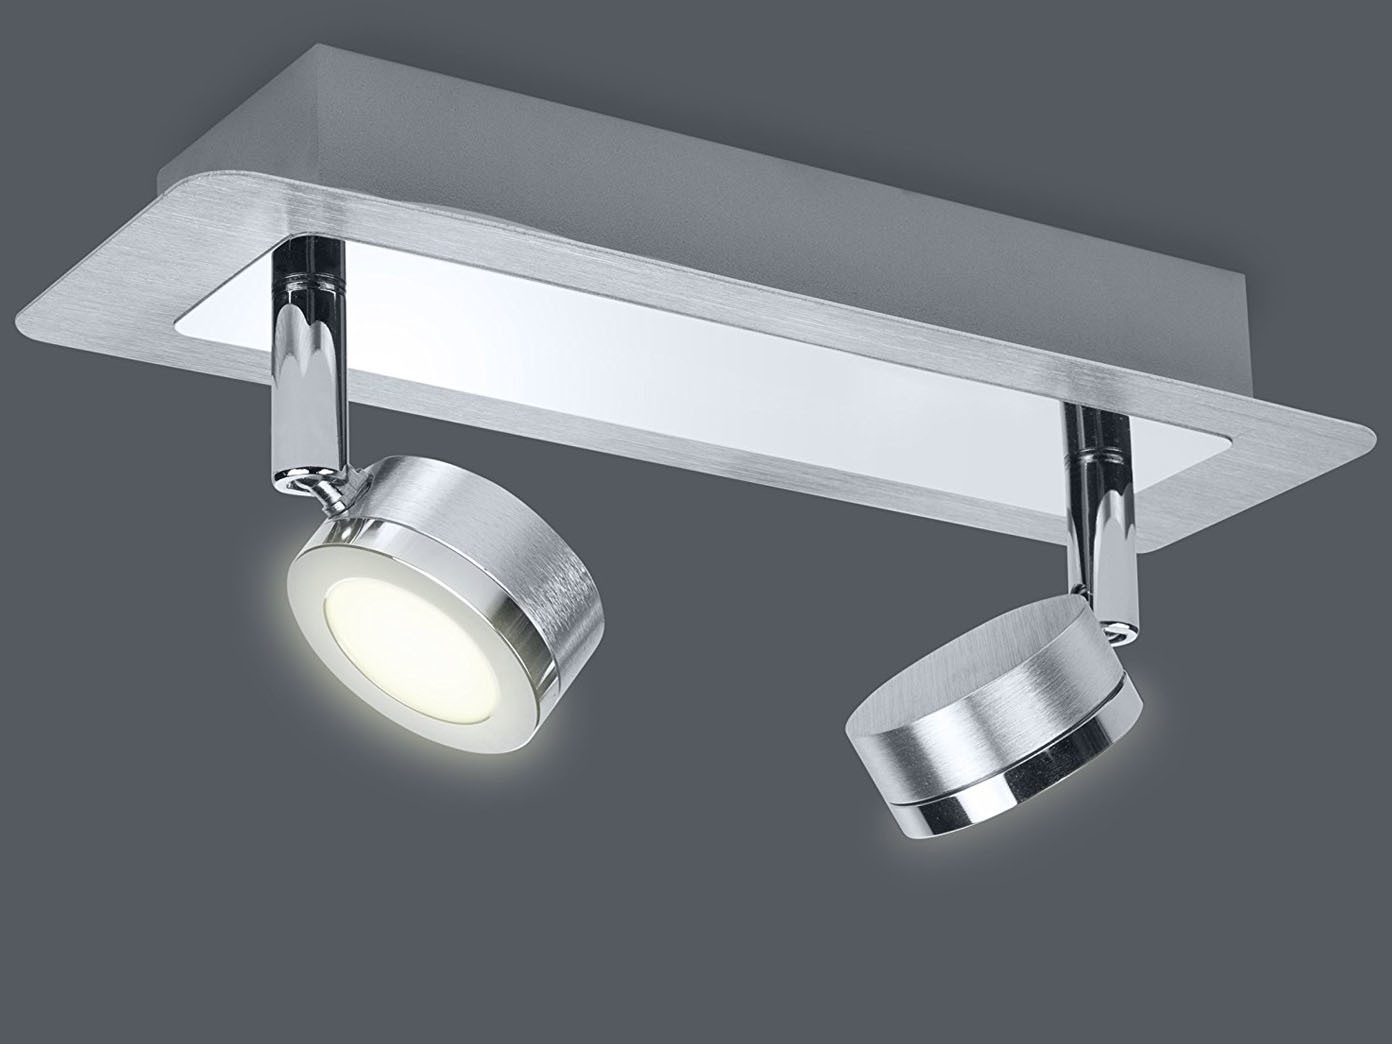 Deckenleuchte Bad LED Deckenspot Edelstahl Badbeleuchtung ...